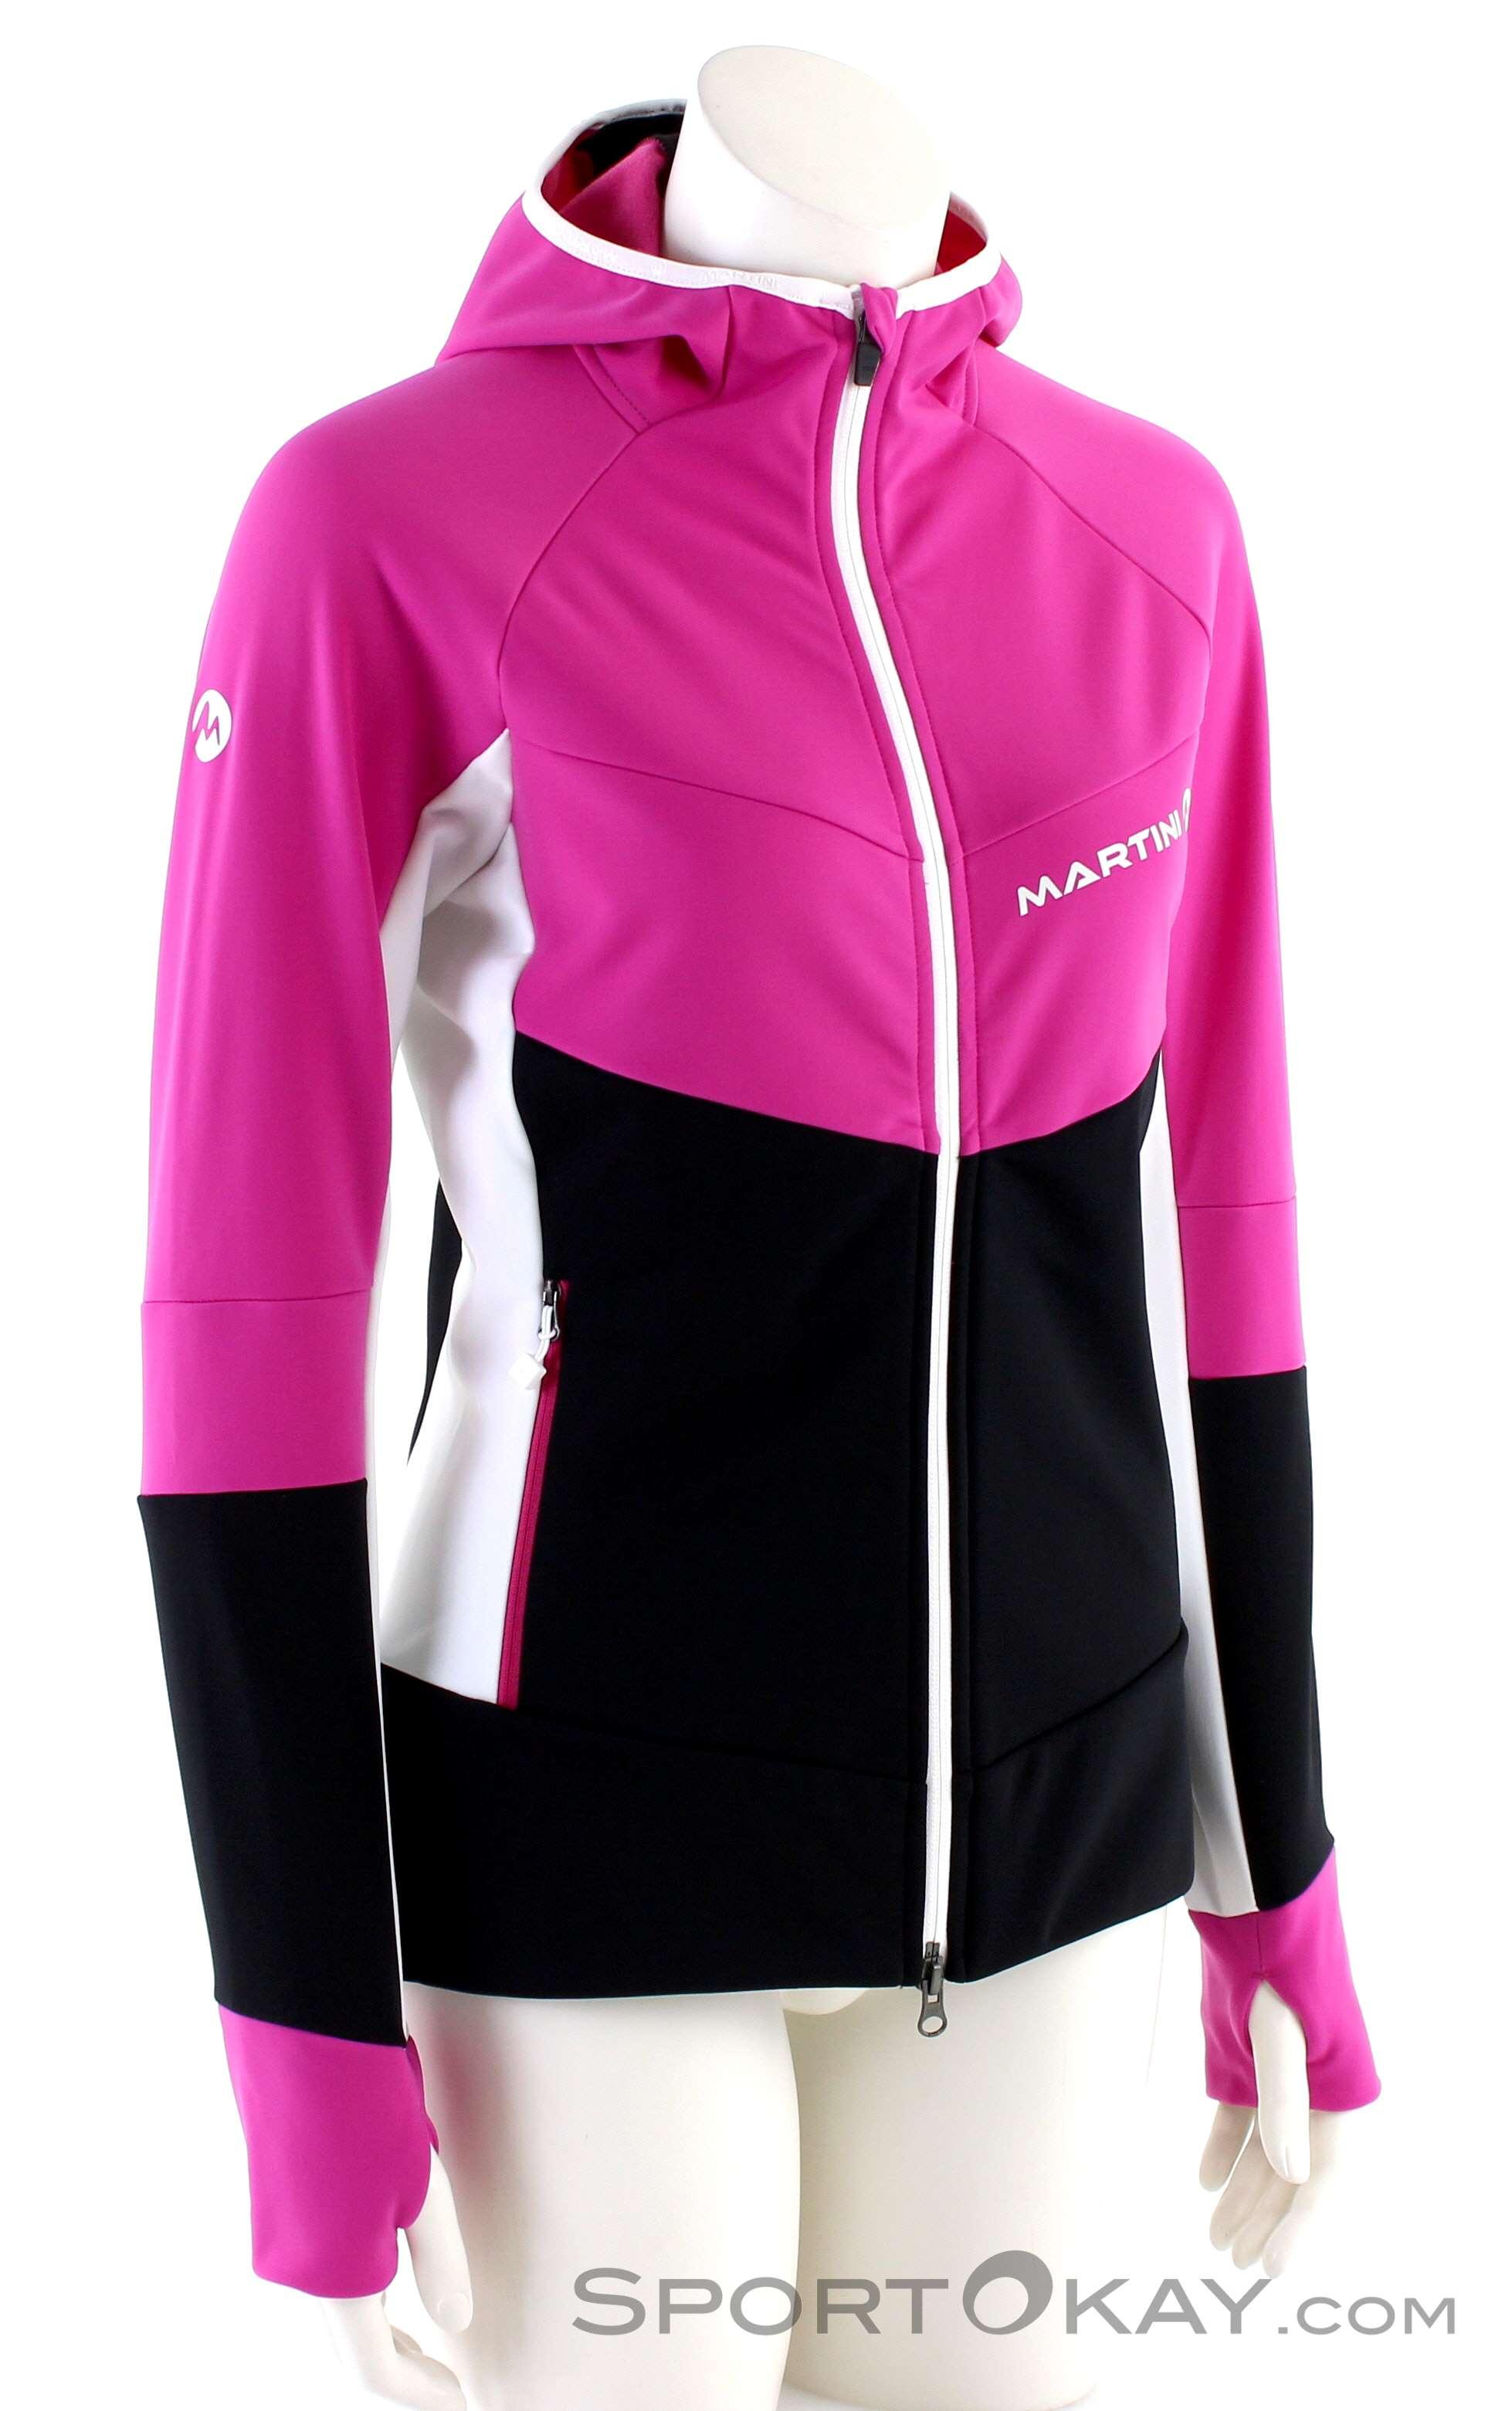 Martini Ultra Plus Damen Tourensweater-Pink-Rosa-S